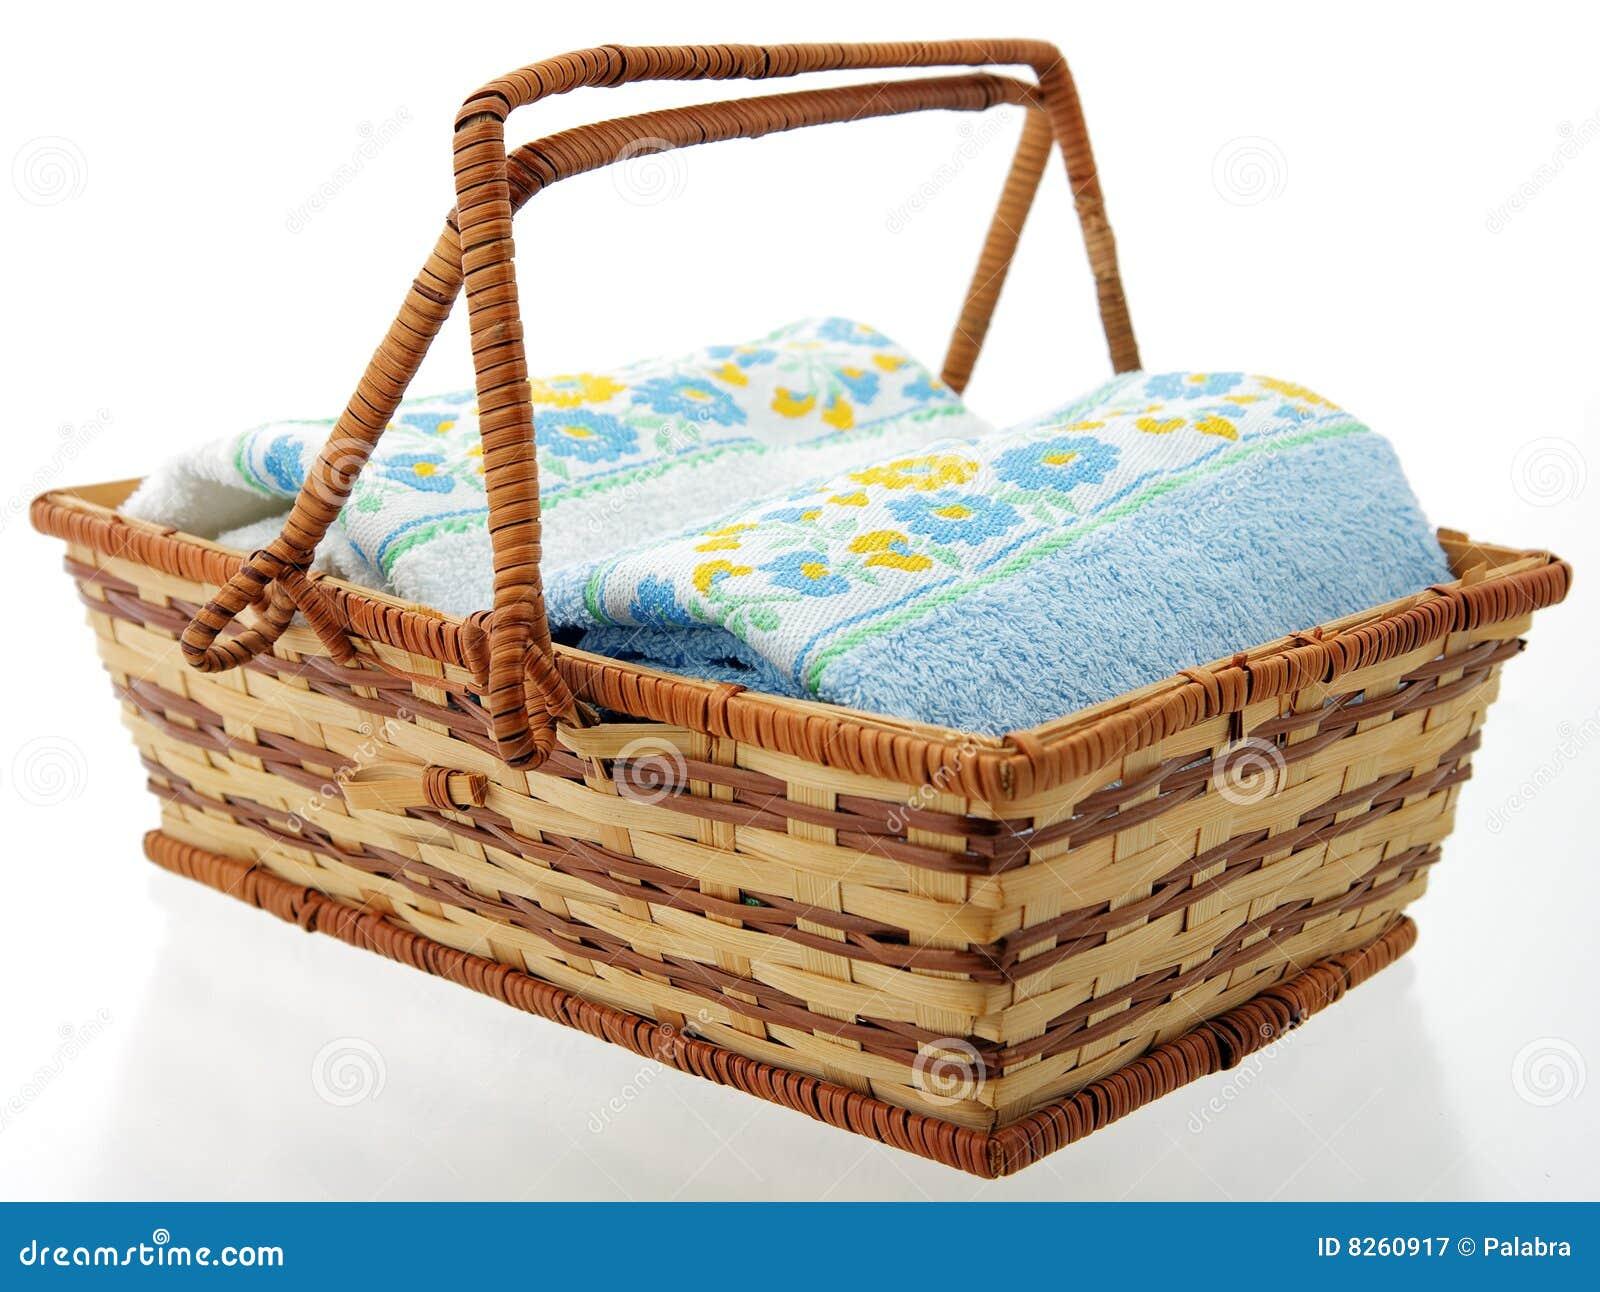 Towel Art Basket : Towels in basket royalty free stock photography image